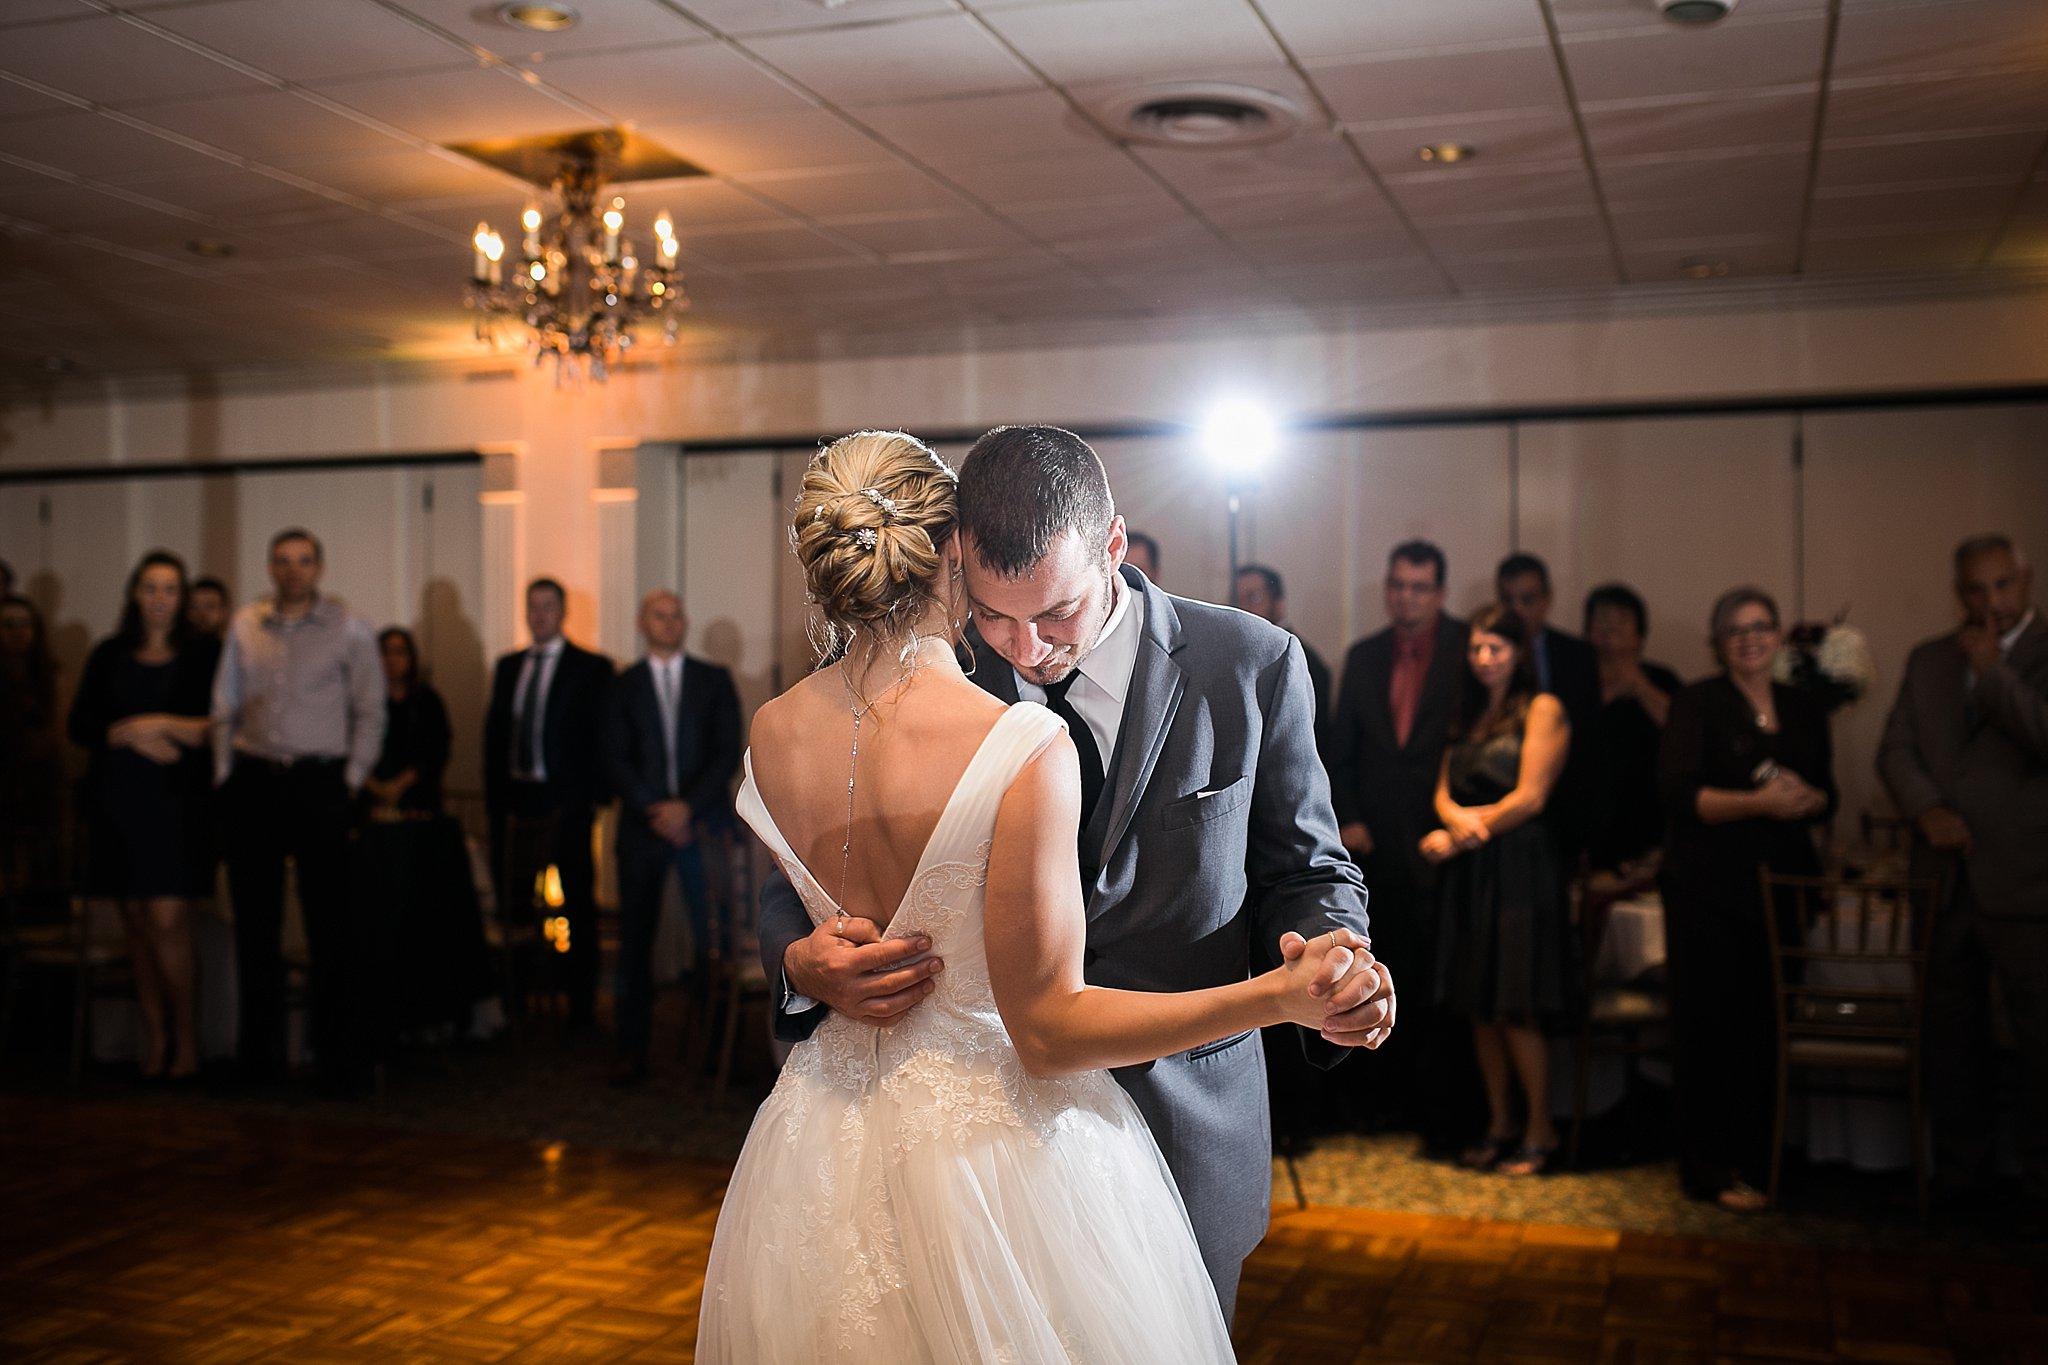 New Windsor New York Hudson Valley New York Wedding Photographer 66.jpg